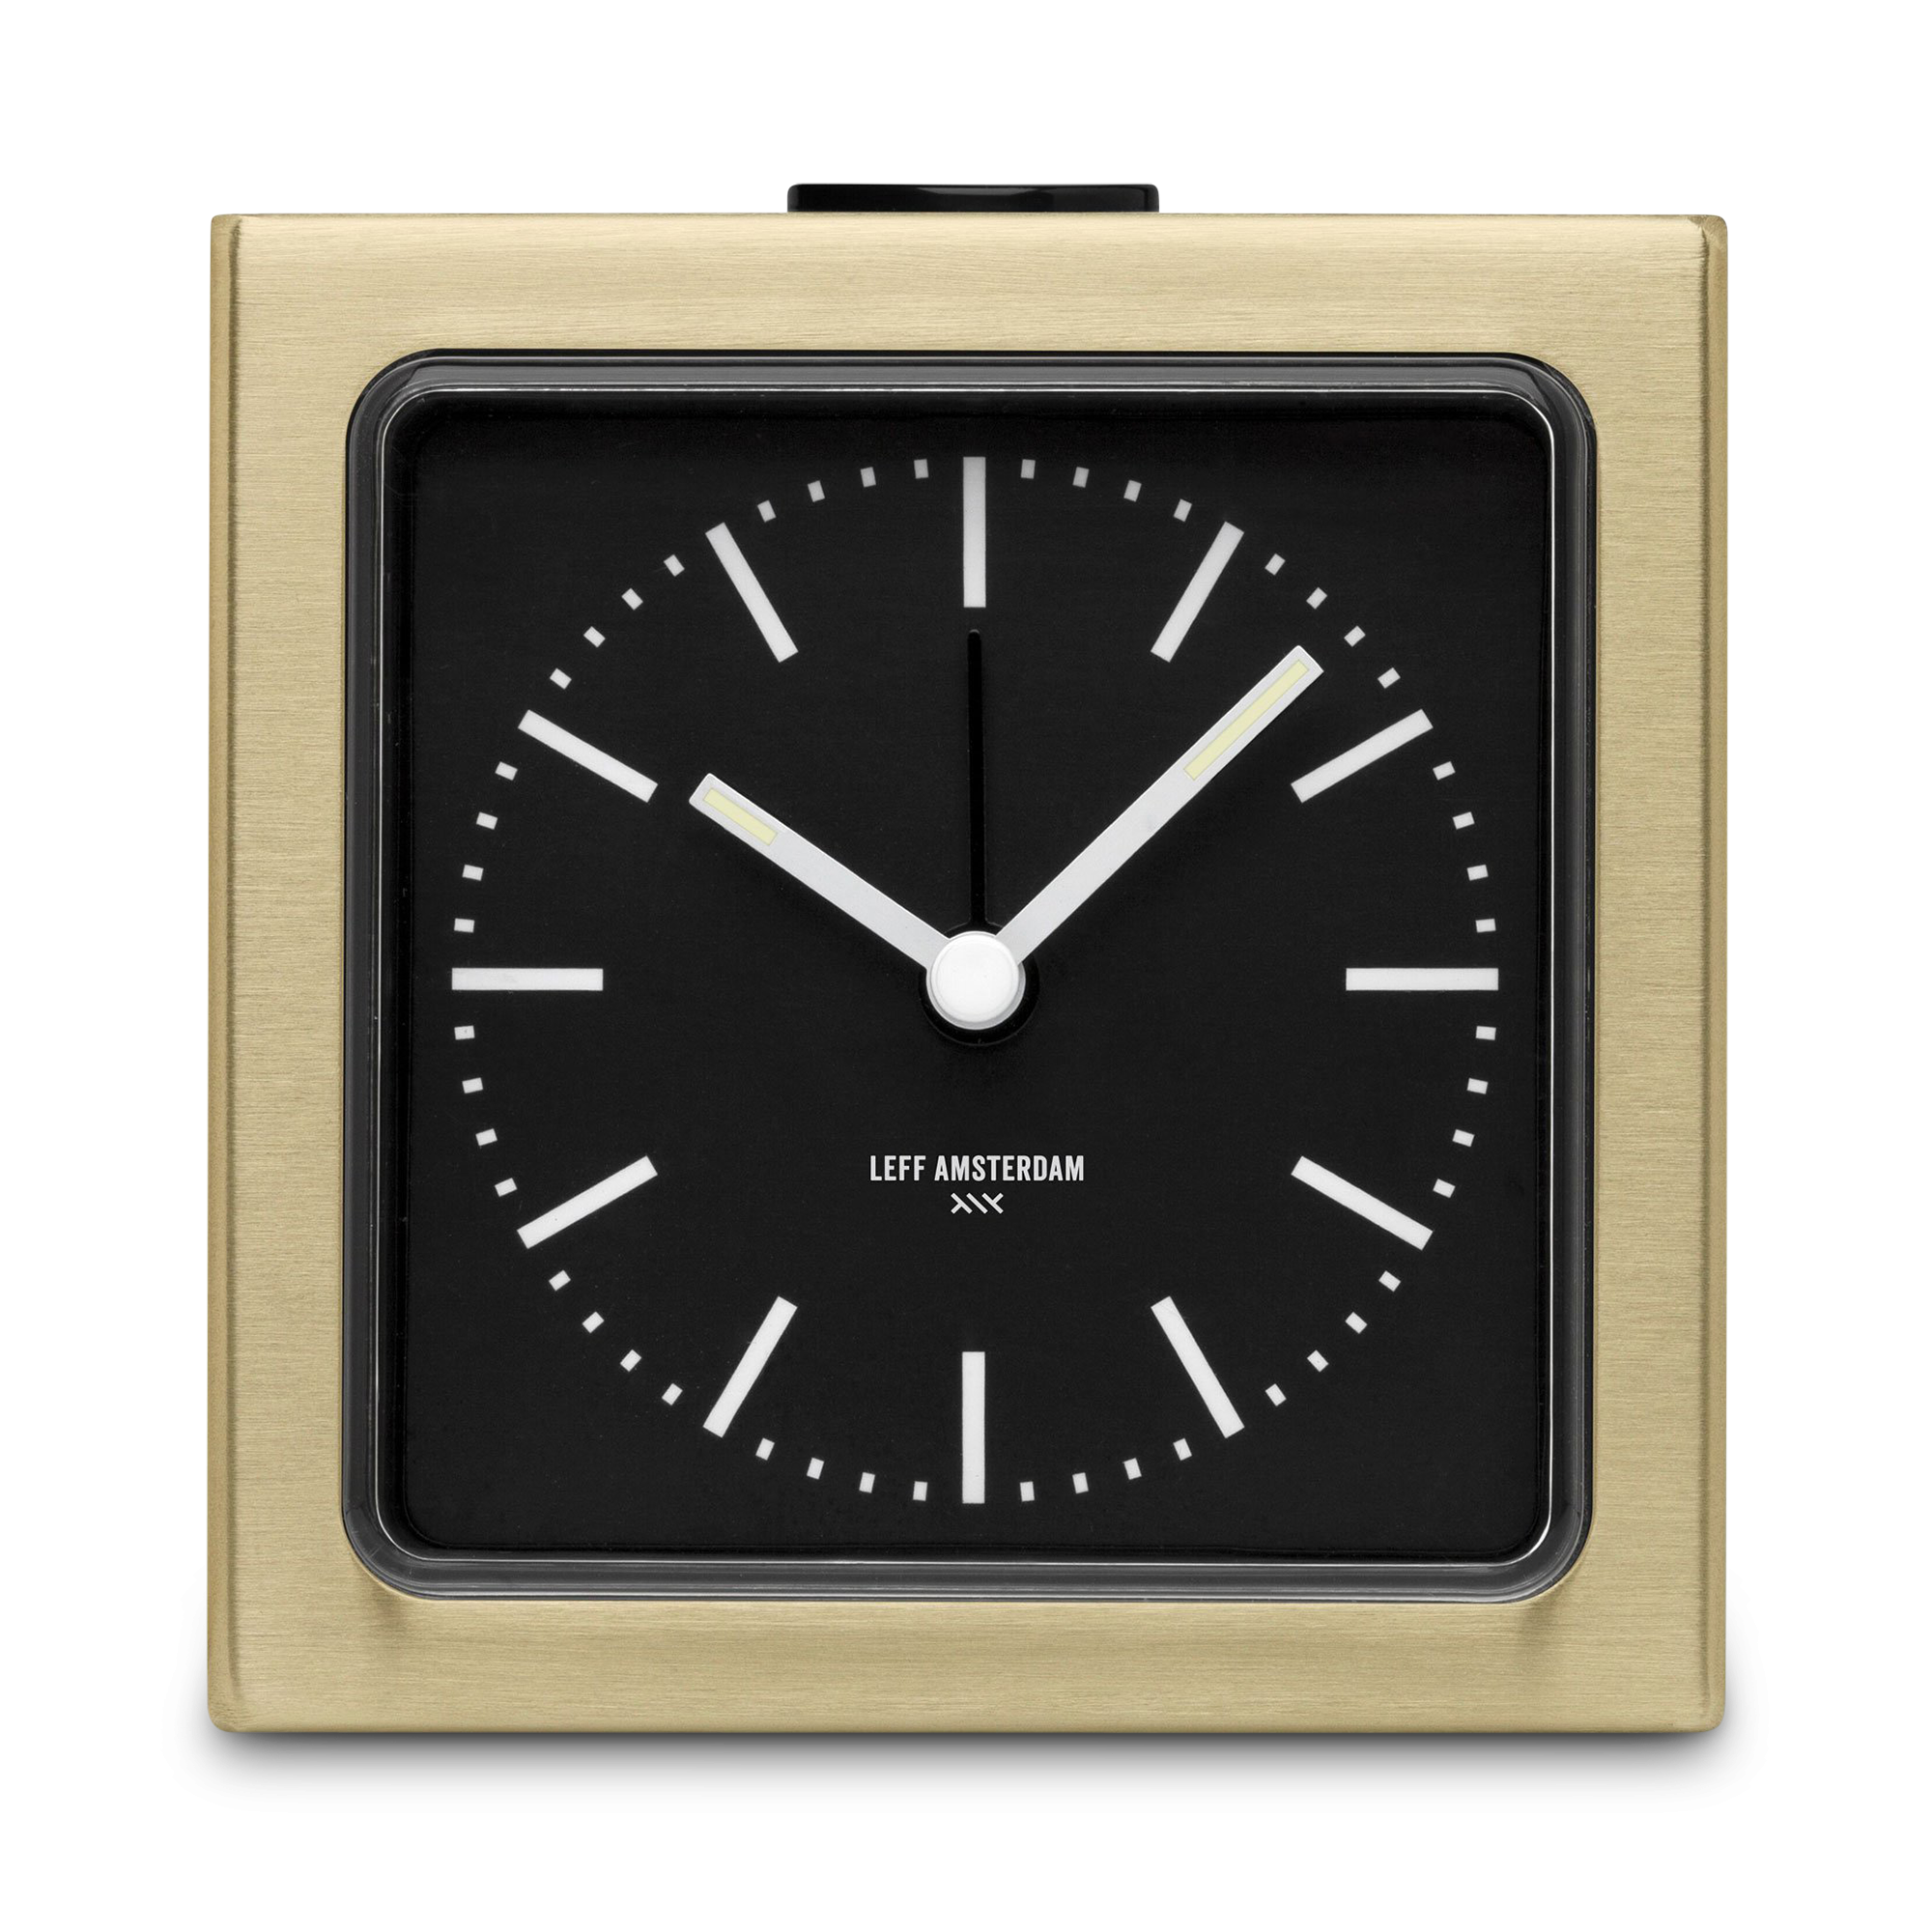 leff-amsterdam-block-alarm-clock-brass-1